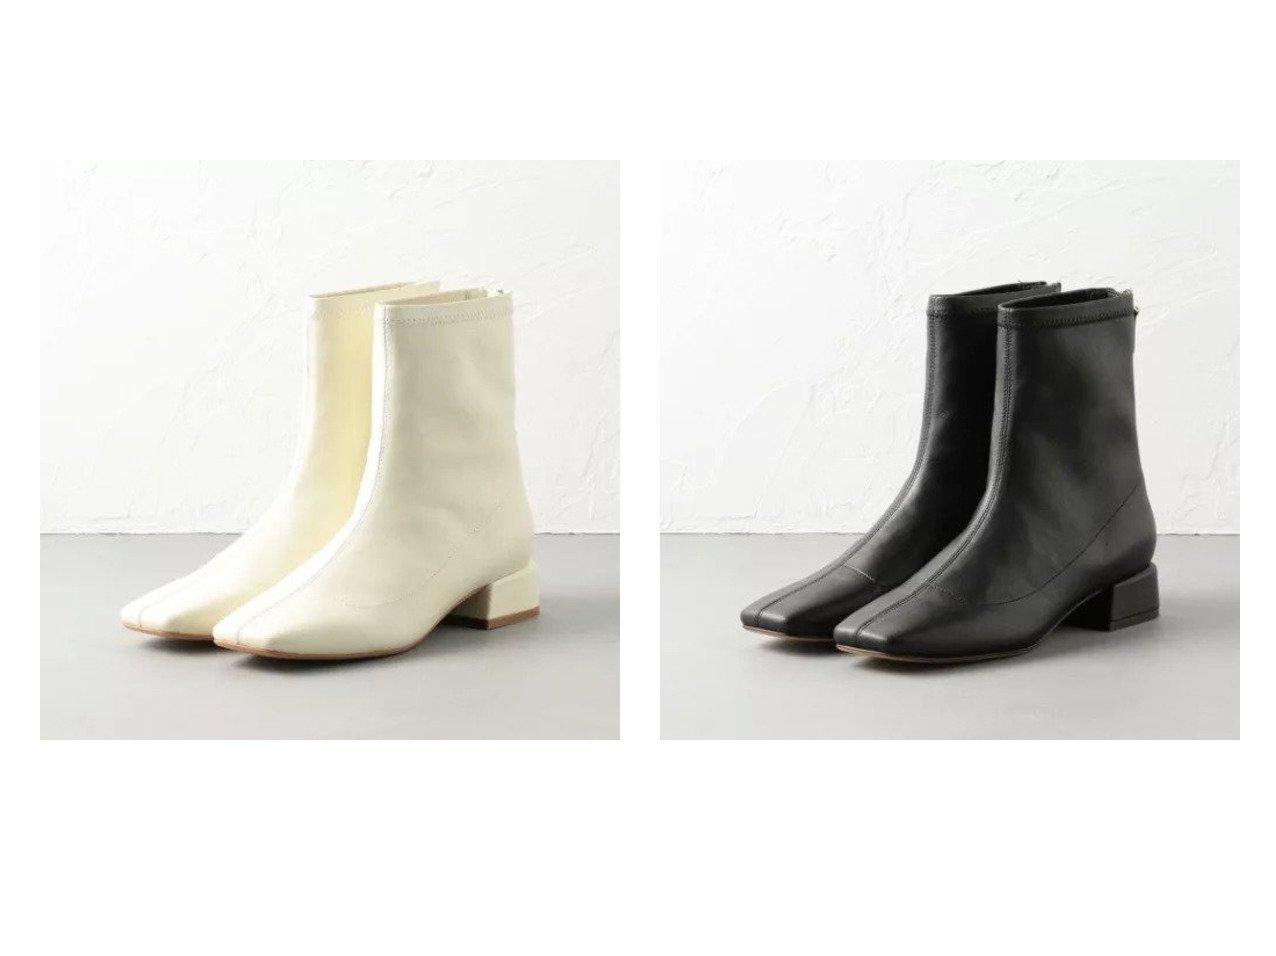 【Odette e Odile/オデット エ オディール】のOFC プレーンストレッチ ショートブーツ35↑ シューズ・靴のおすすめ!人気、トレンド・レディースファッションの通販 おすすめで人気の流行・トレンド、ファッションの通販商品 メンズファッション・キッズファッション・インテリア・家具・レディースファッション・服の通販 founy(ファニー) https://founy.com/ ファッション Fashion レディースファッション WOMEN シューズ ショート ストレッチ フィット  ID:crp329100000012465